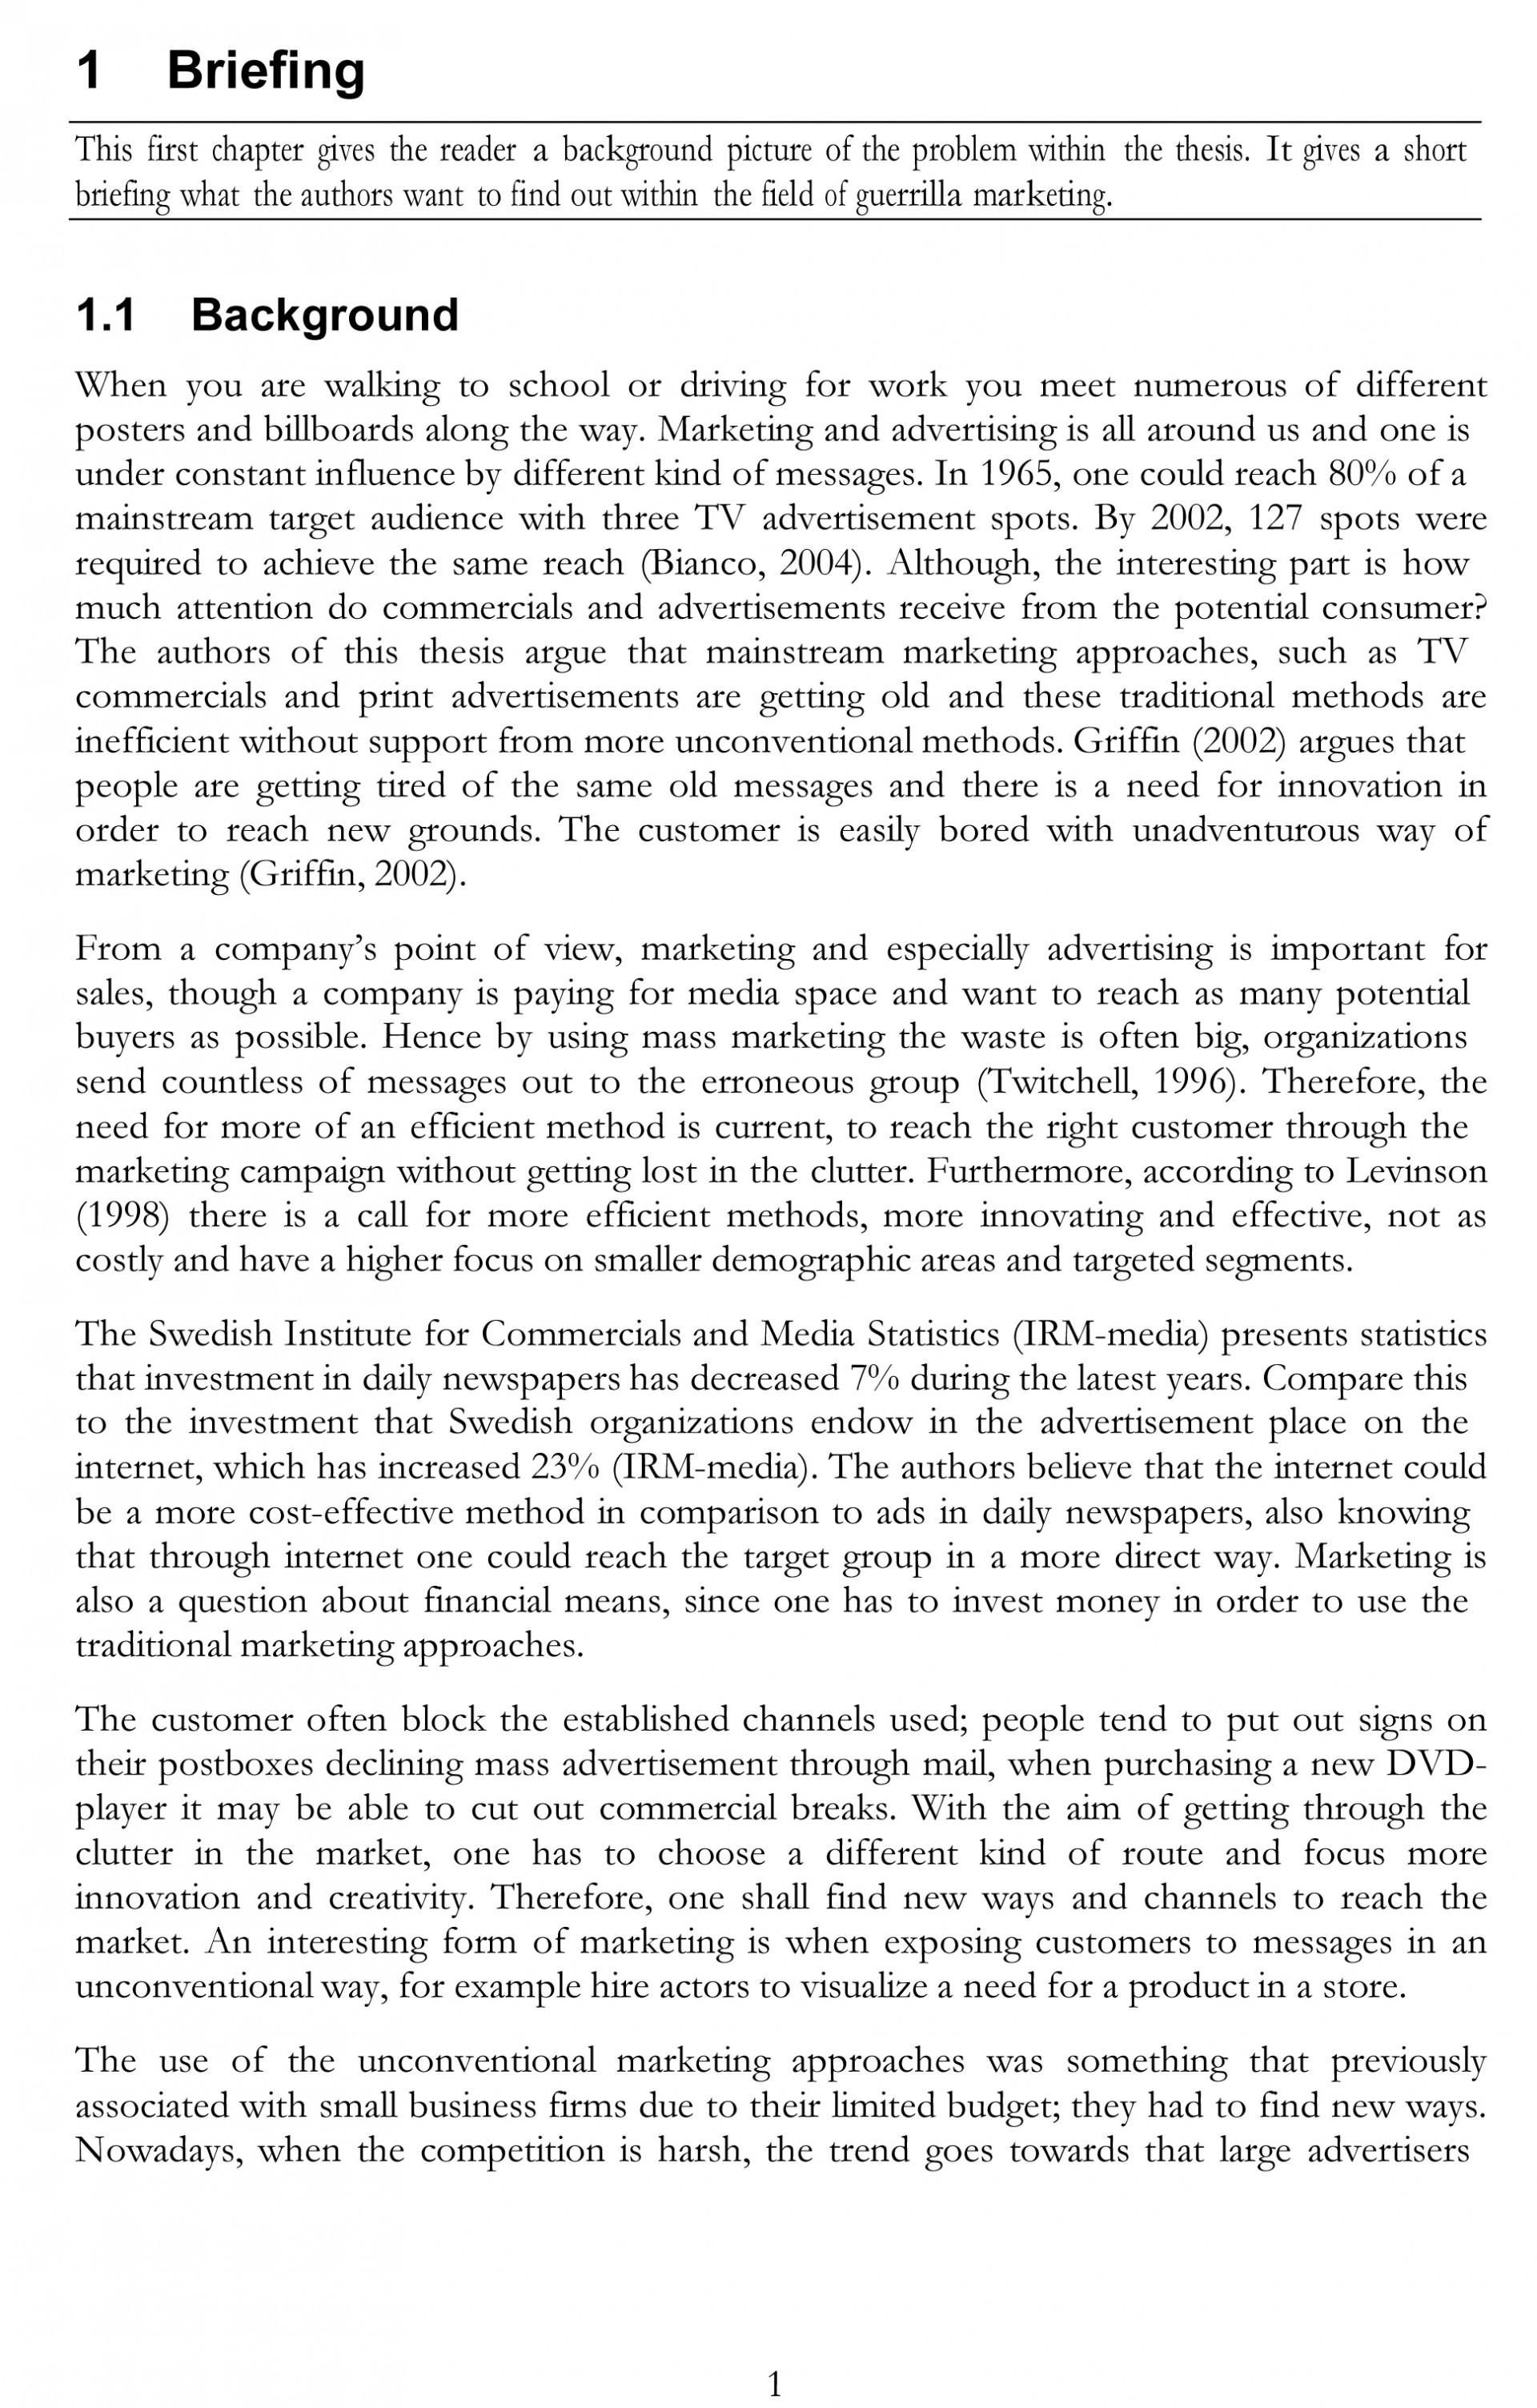 012 Marketing Thesis Free Sample College Essay Generator Amazing Outline Idea 1920